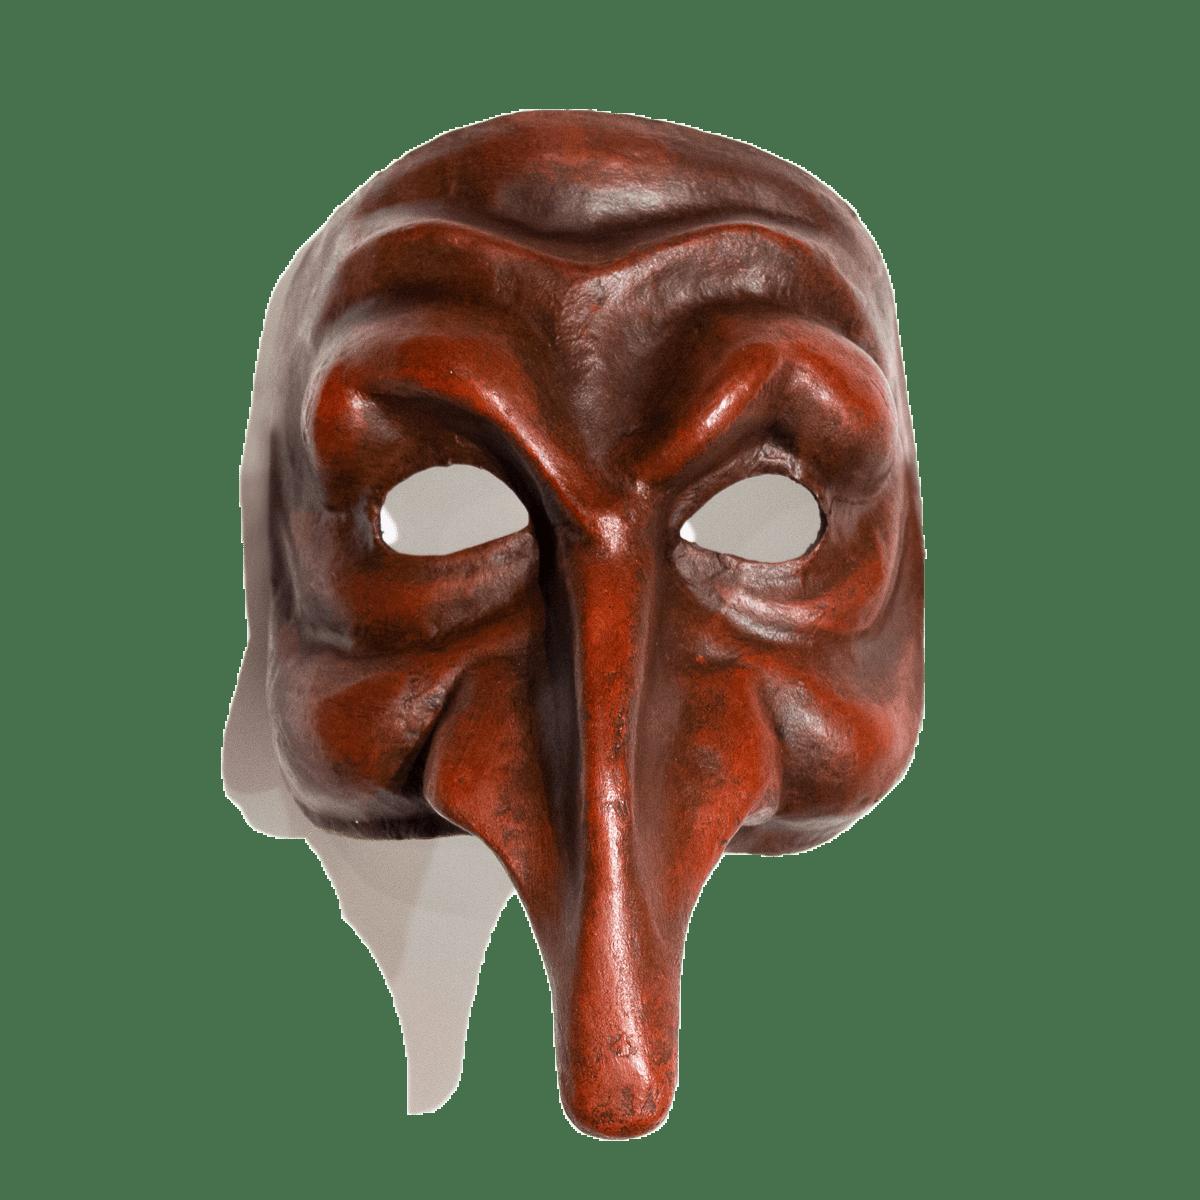 https://i0.wp.com/www.masksvenice.com/wp-content/uploads/2018/09/cartapesta-pantalone.png?fit=1200%2C1200&ssl=1